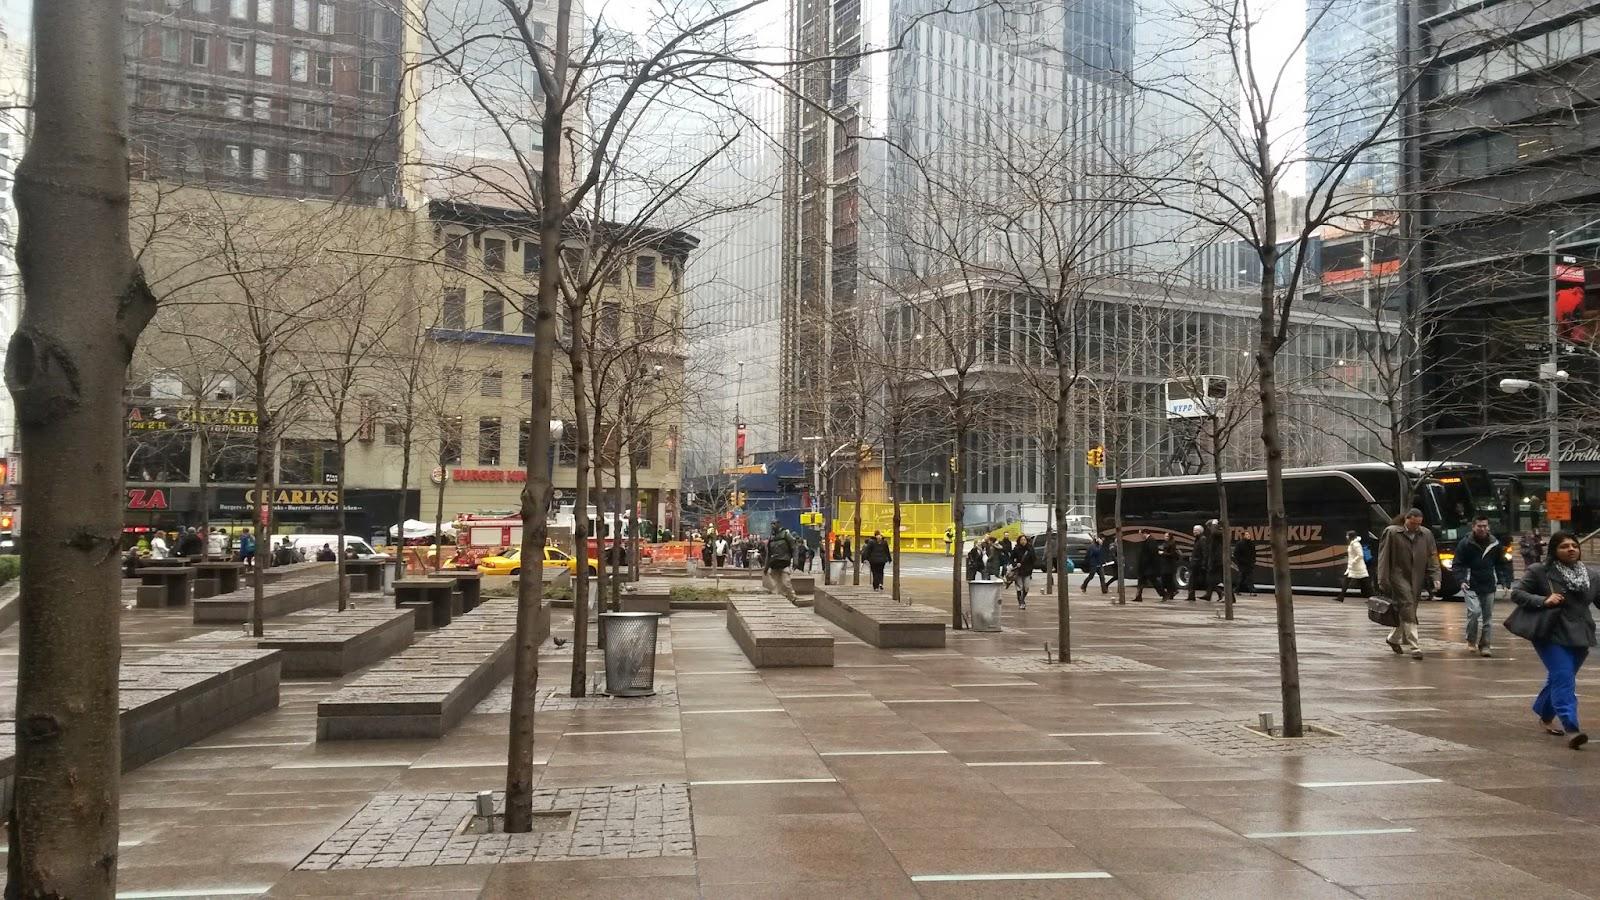 Zuccotti Park, Distrito Financiero, New York, Elisa N, Blog de Viajes, Lifestyle, Travel